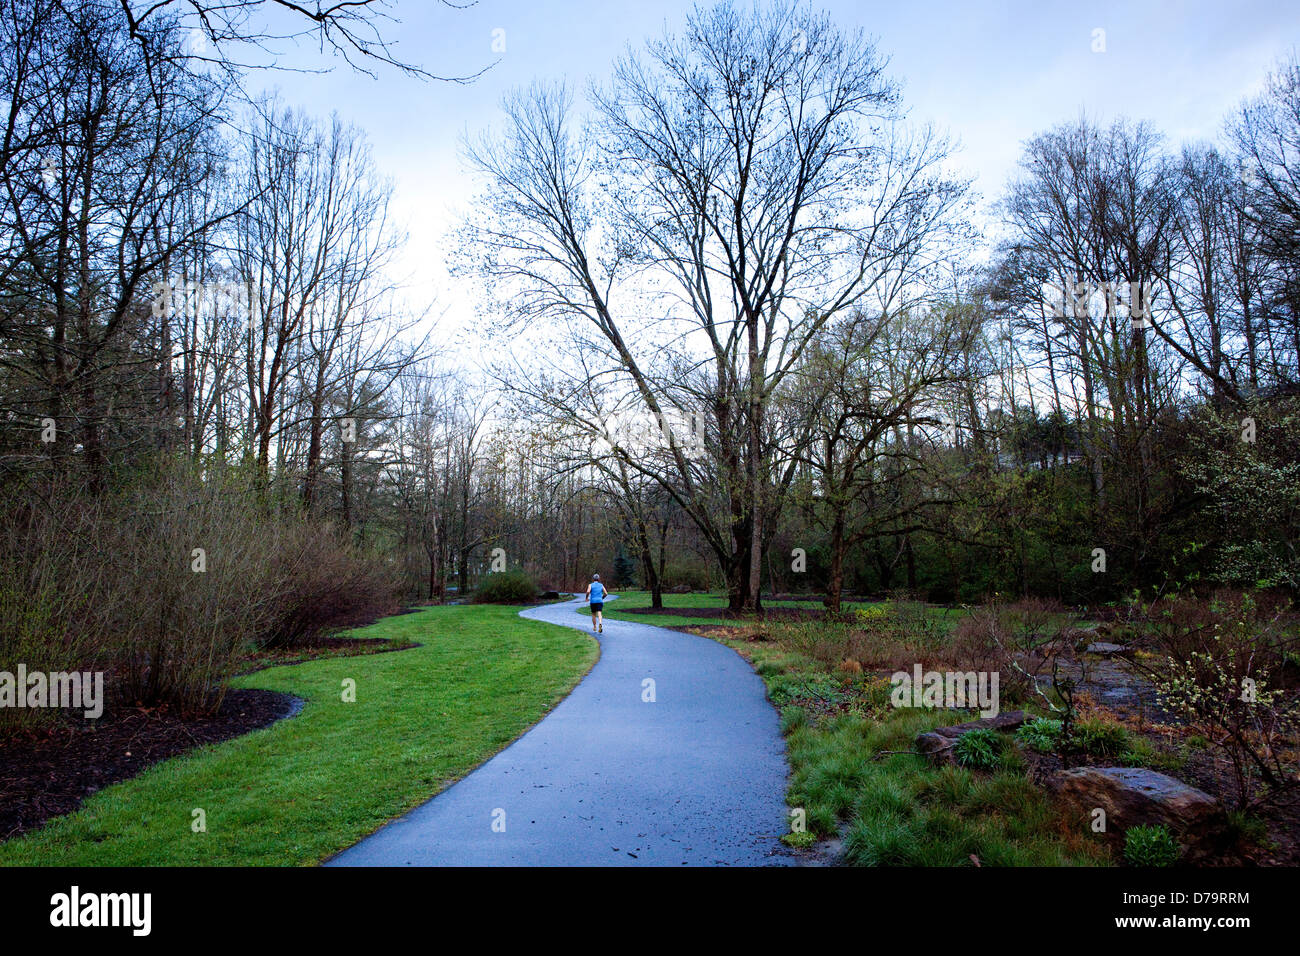 A view of Glenn's Creek Greenway in Asheville, North Carolina - Stock Image